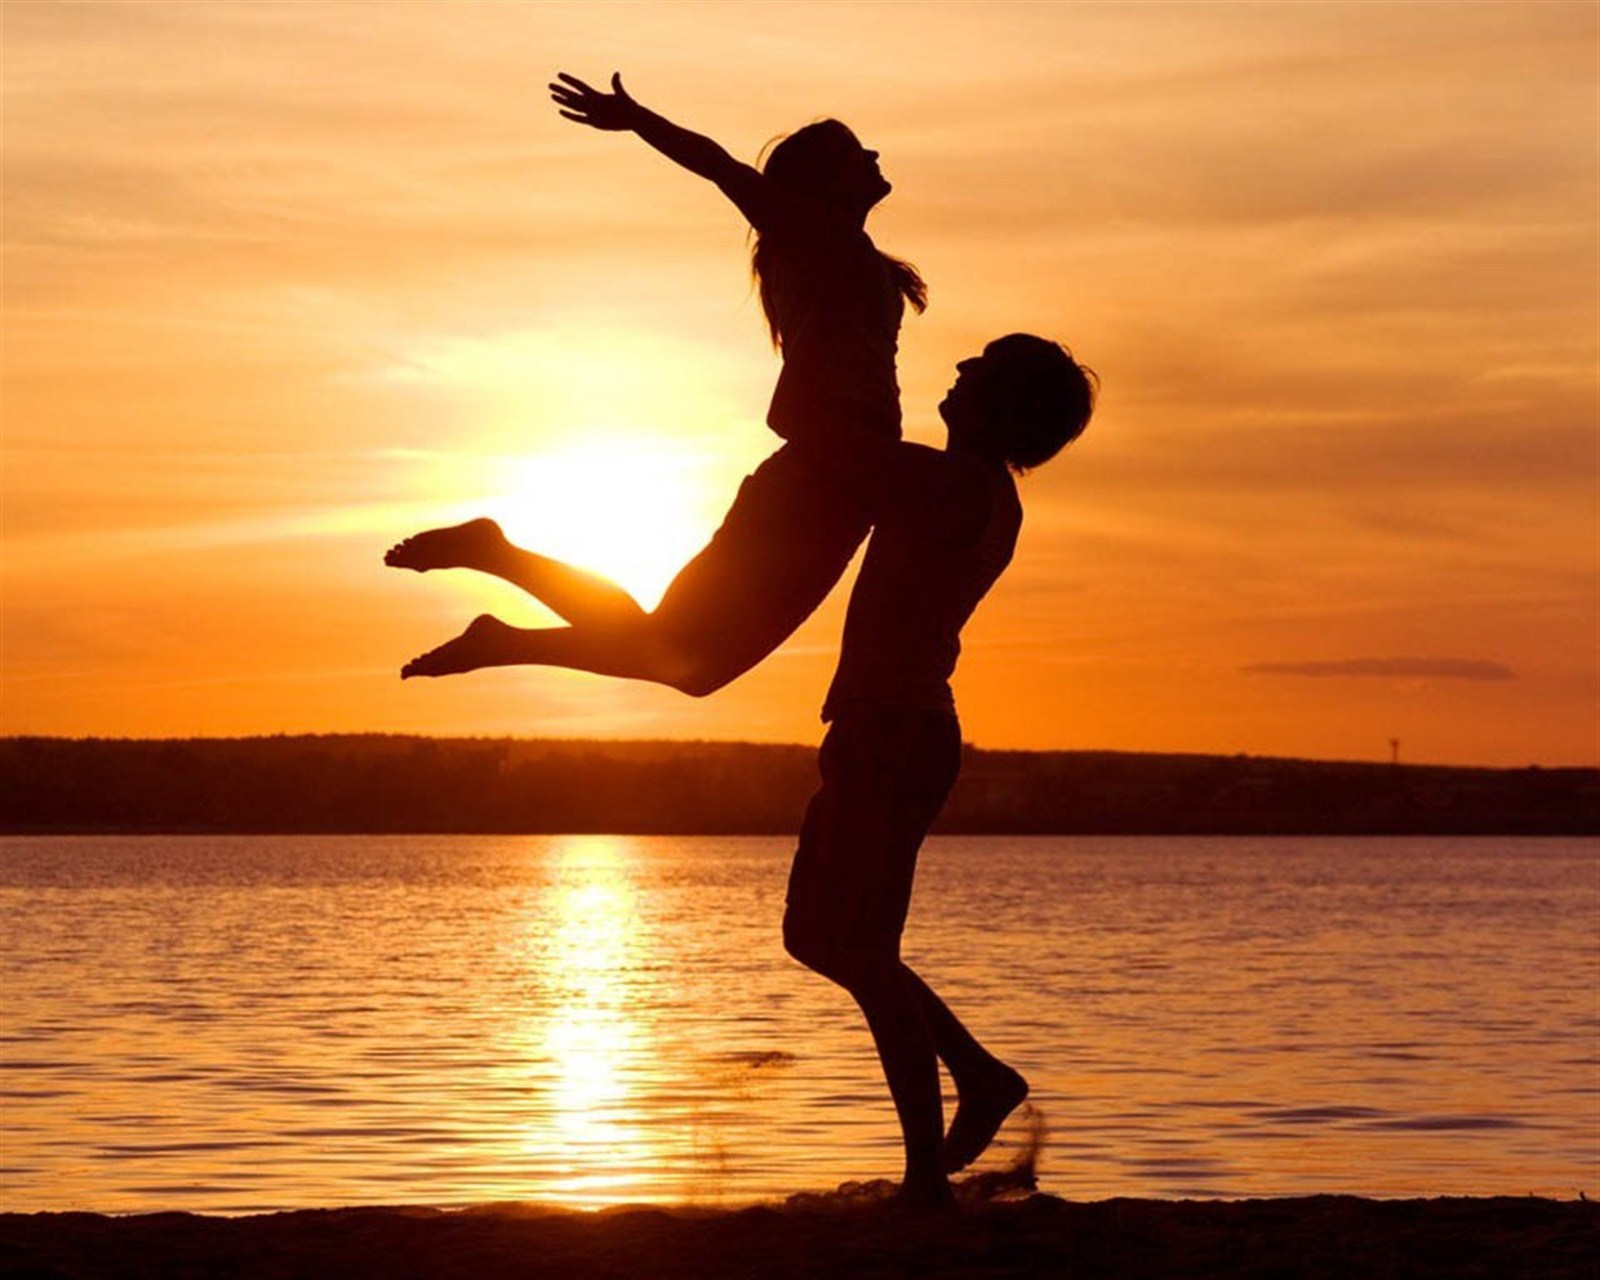 img 1388333461 515 اجدد صور قلوب حب للتصميم , صور خلفيات قلوب رومانتيك